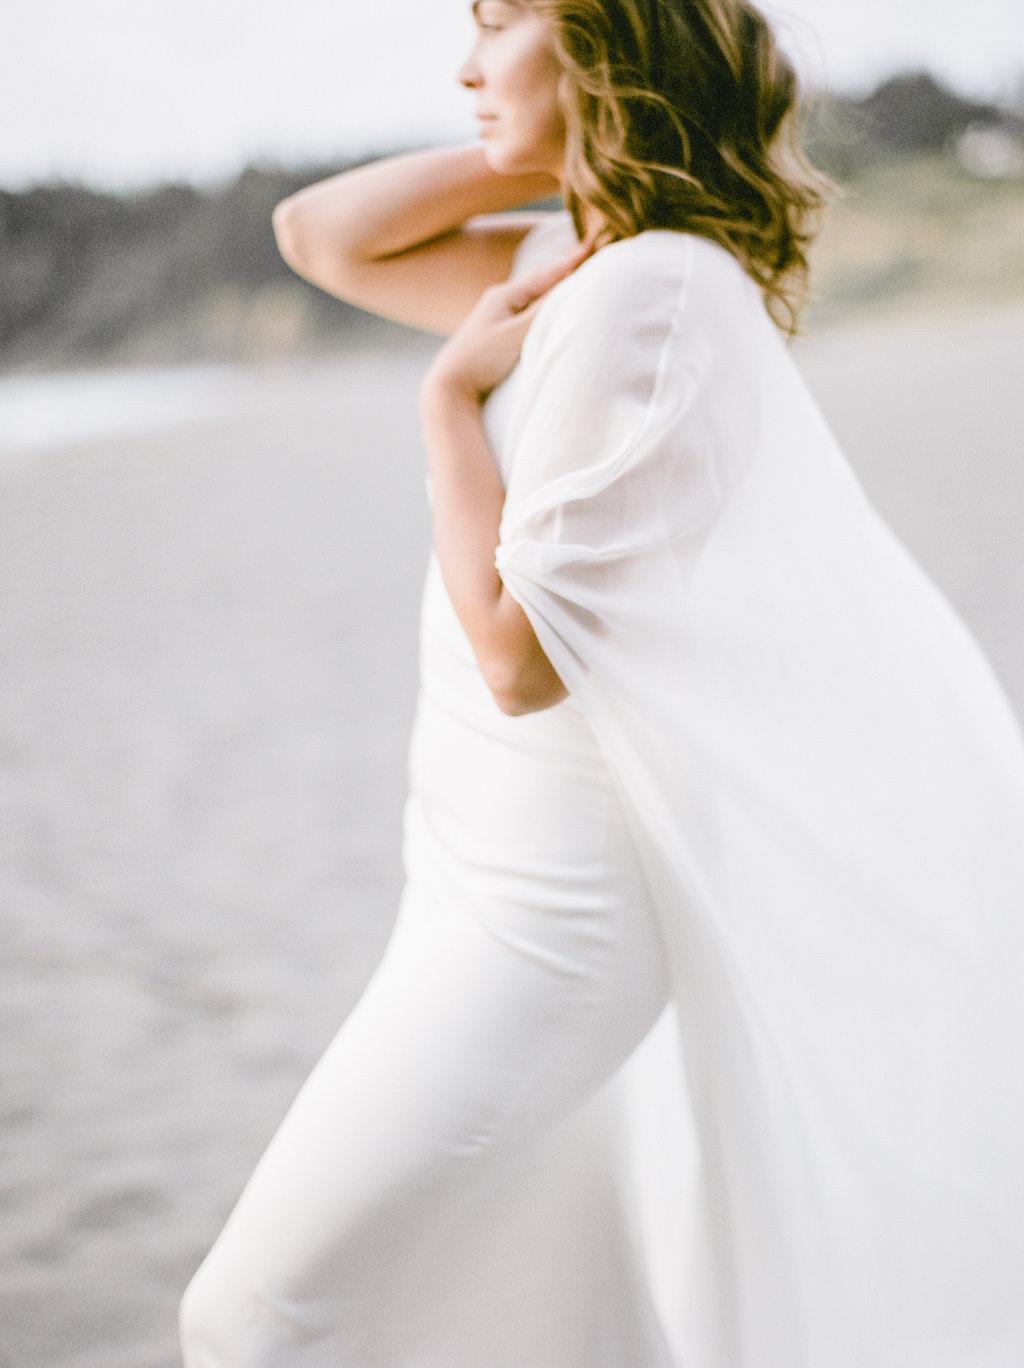 California Beach Wedding | Beach Wedding | Minimalist Wedding | Madalina Sheldon | Anda Ambrosini | Fine Art Wedding Blog | Canadian Wedding Blog | White Wedding | Joy Wed